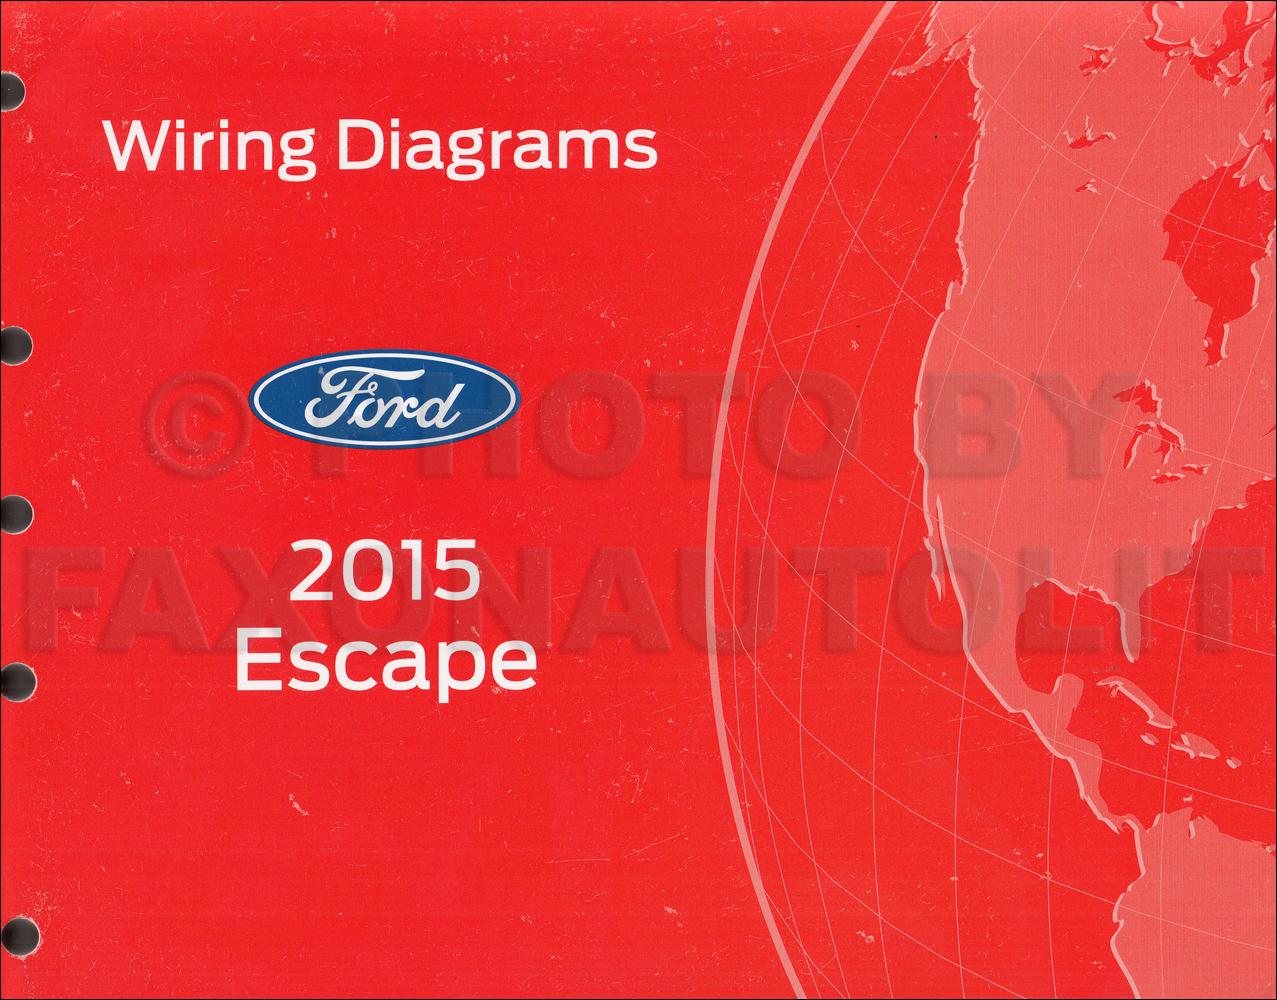 2001 Ford Escape Wiring Diagram Manual Original